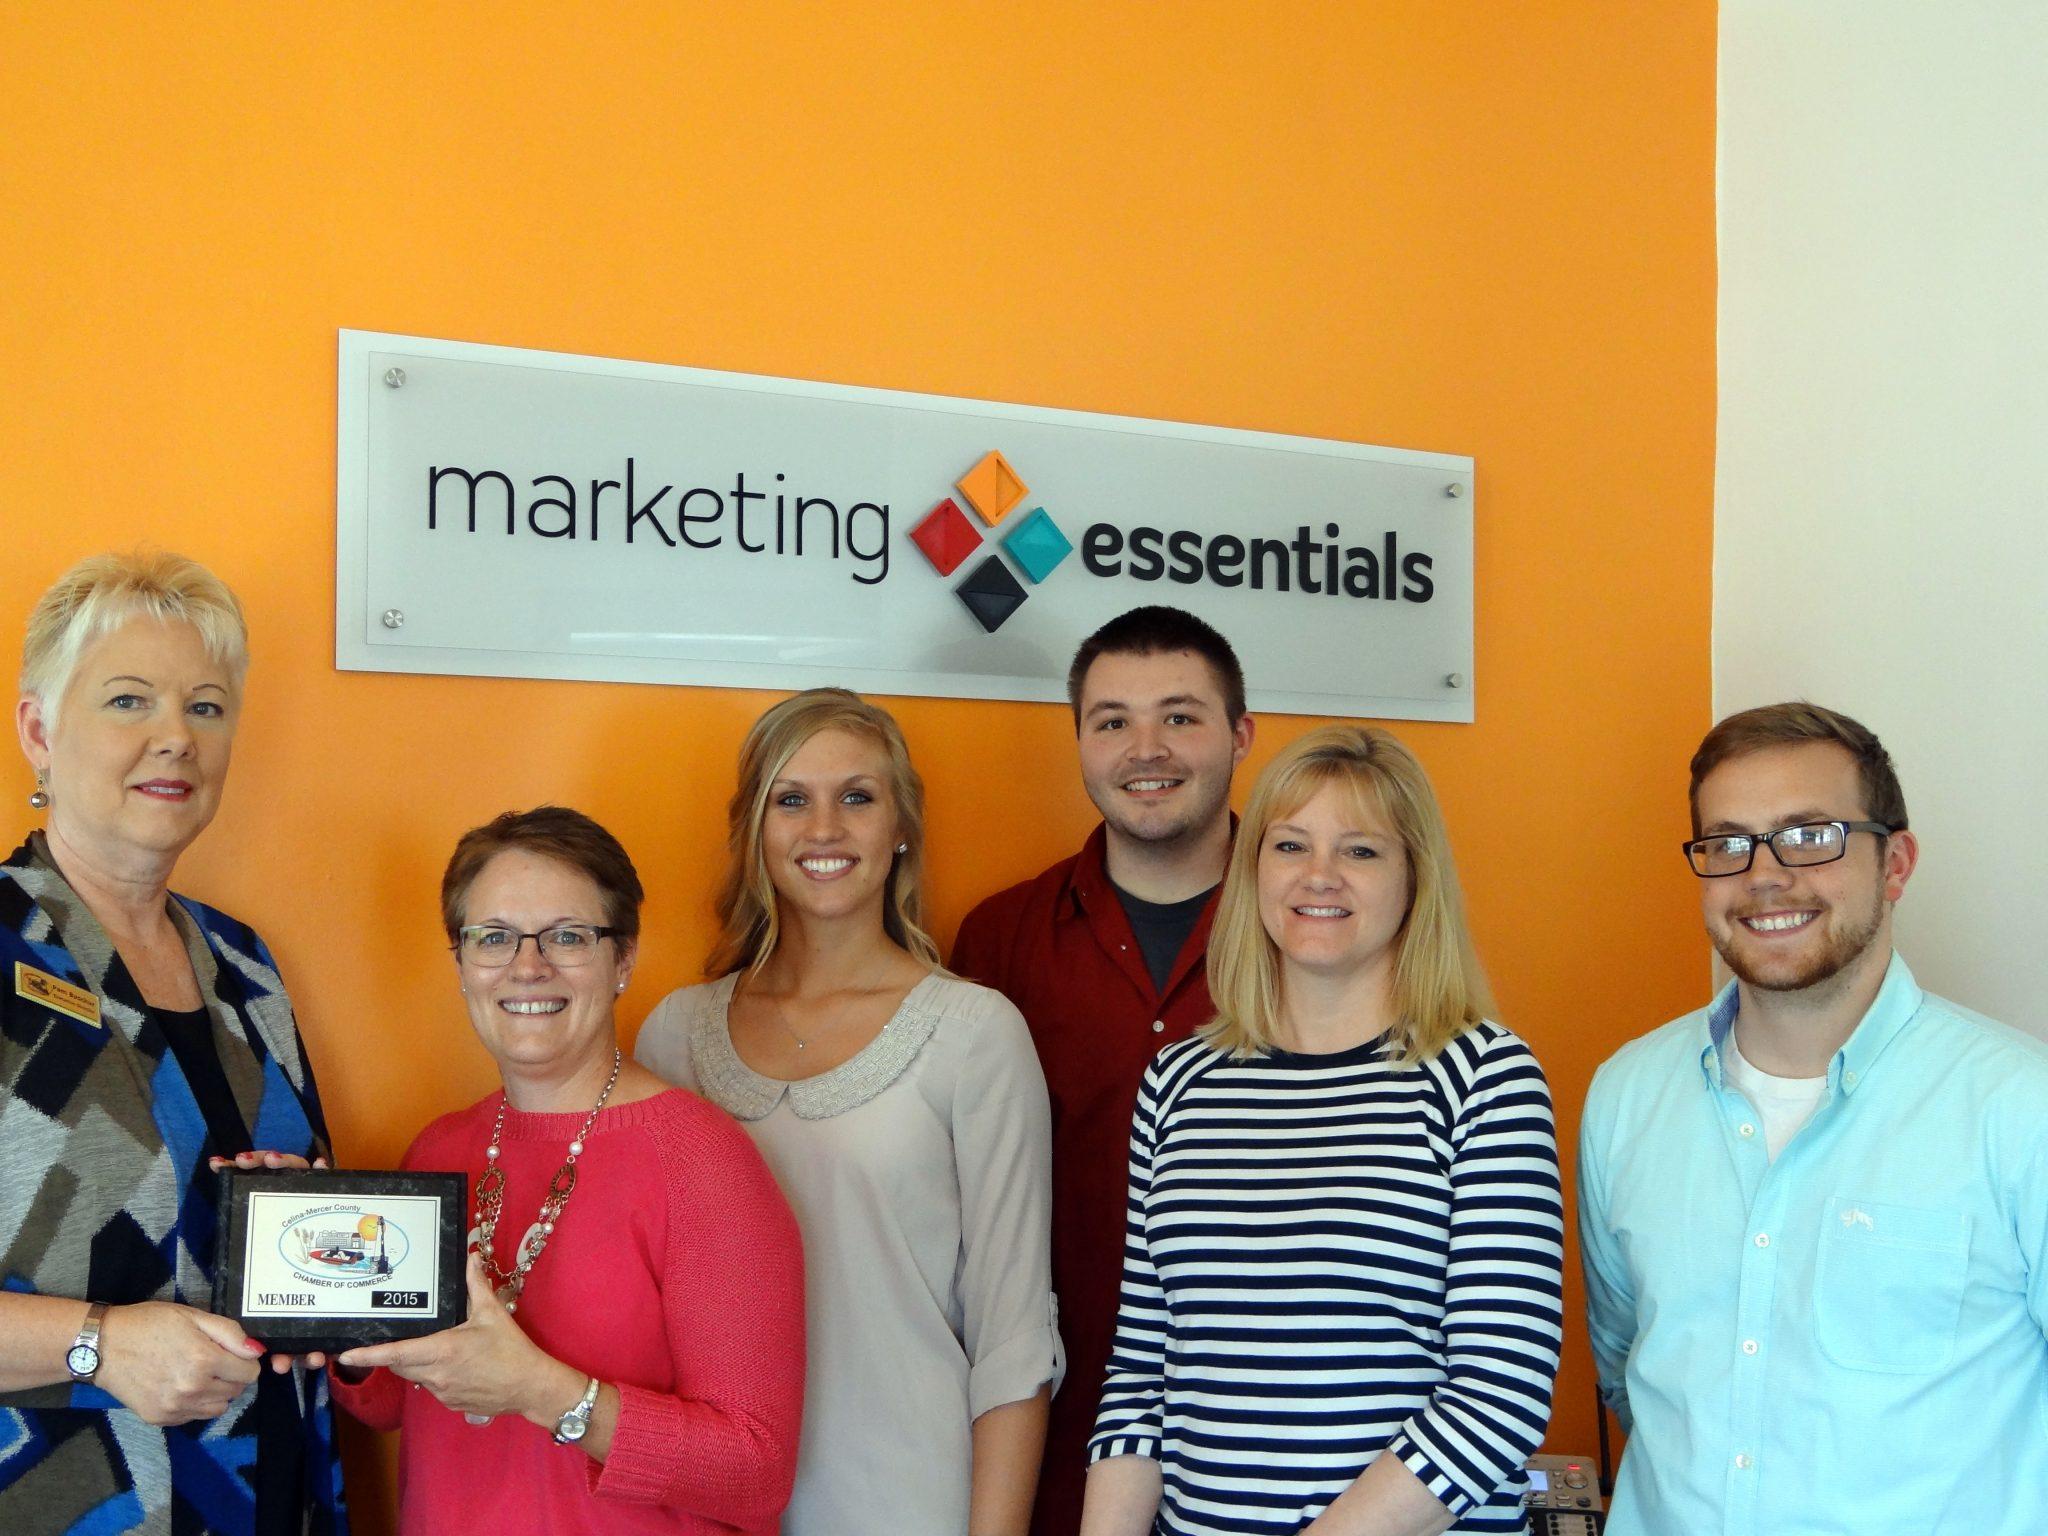 Marketing Essentials LLC joins Chamber